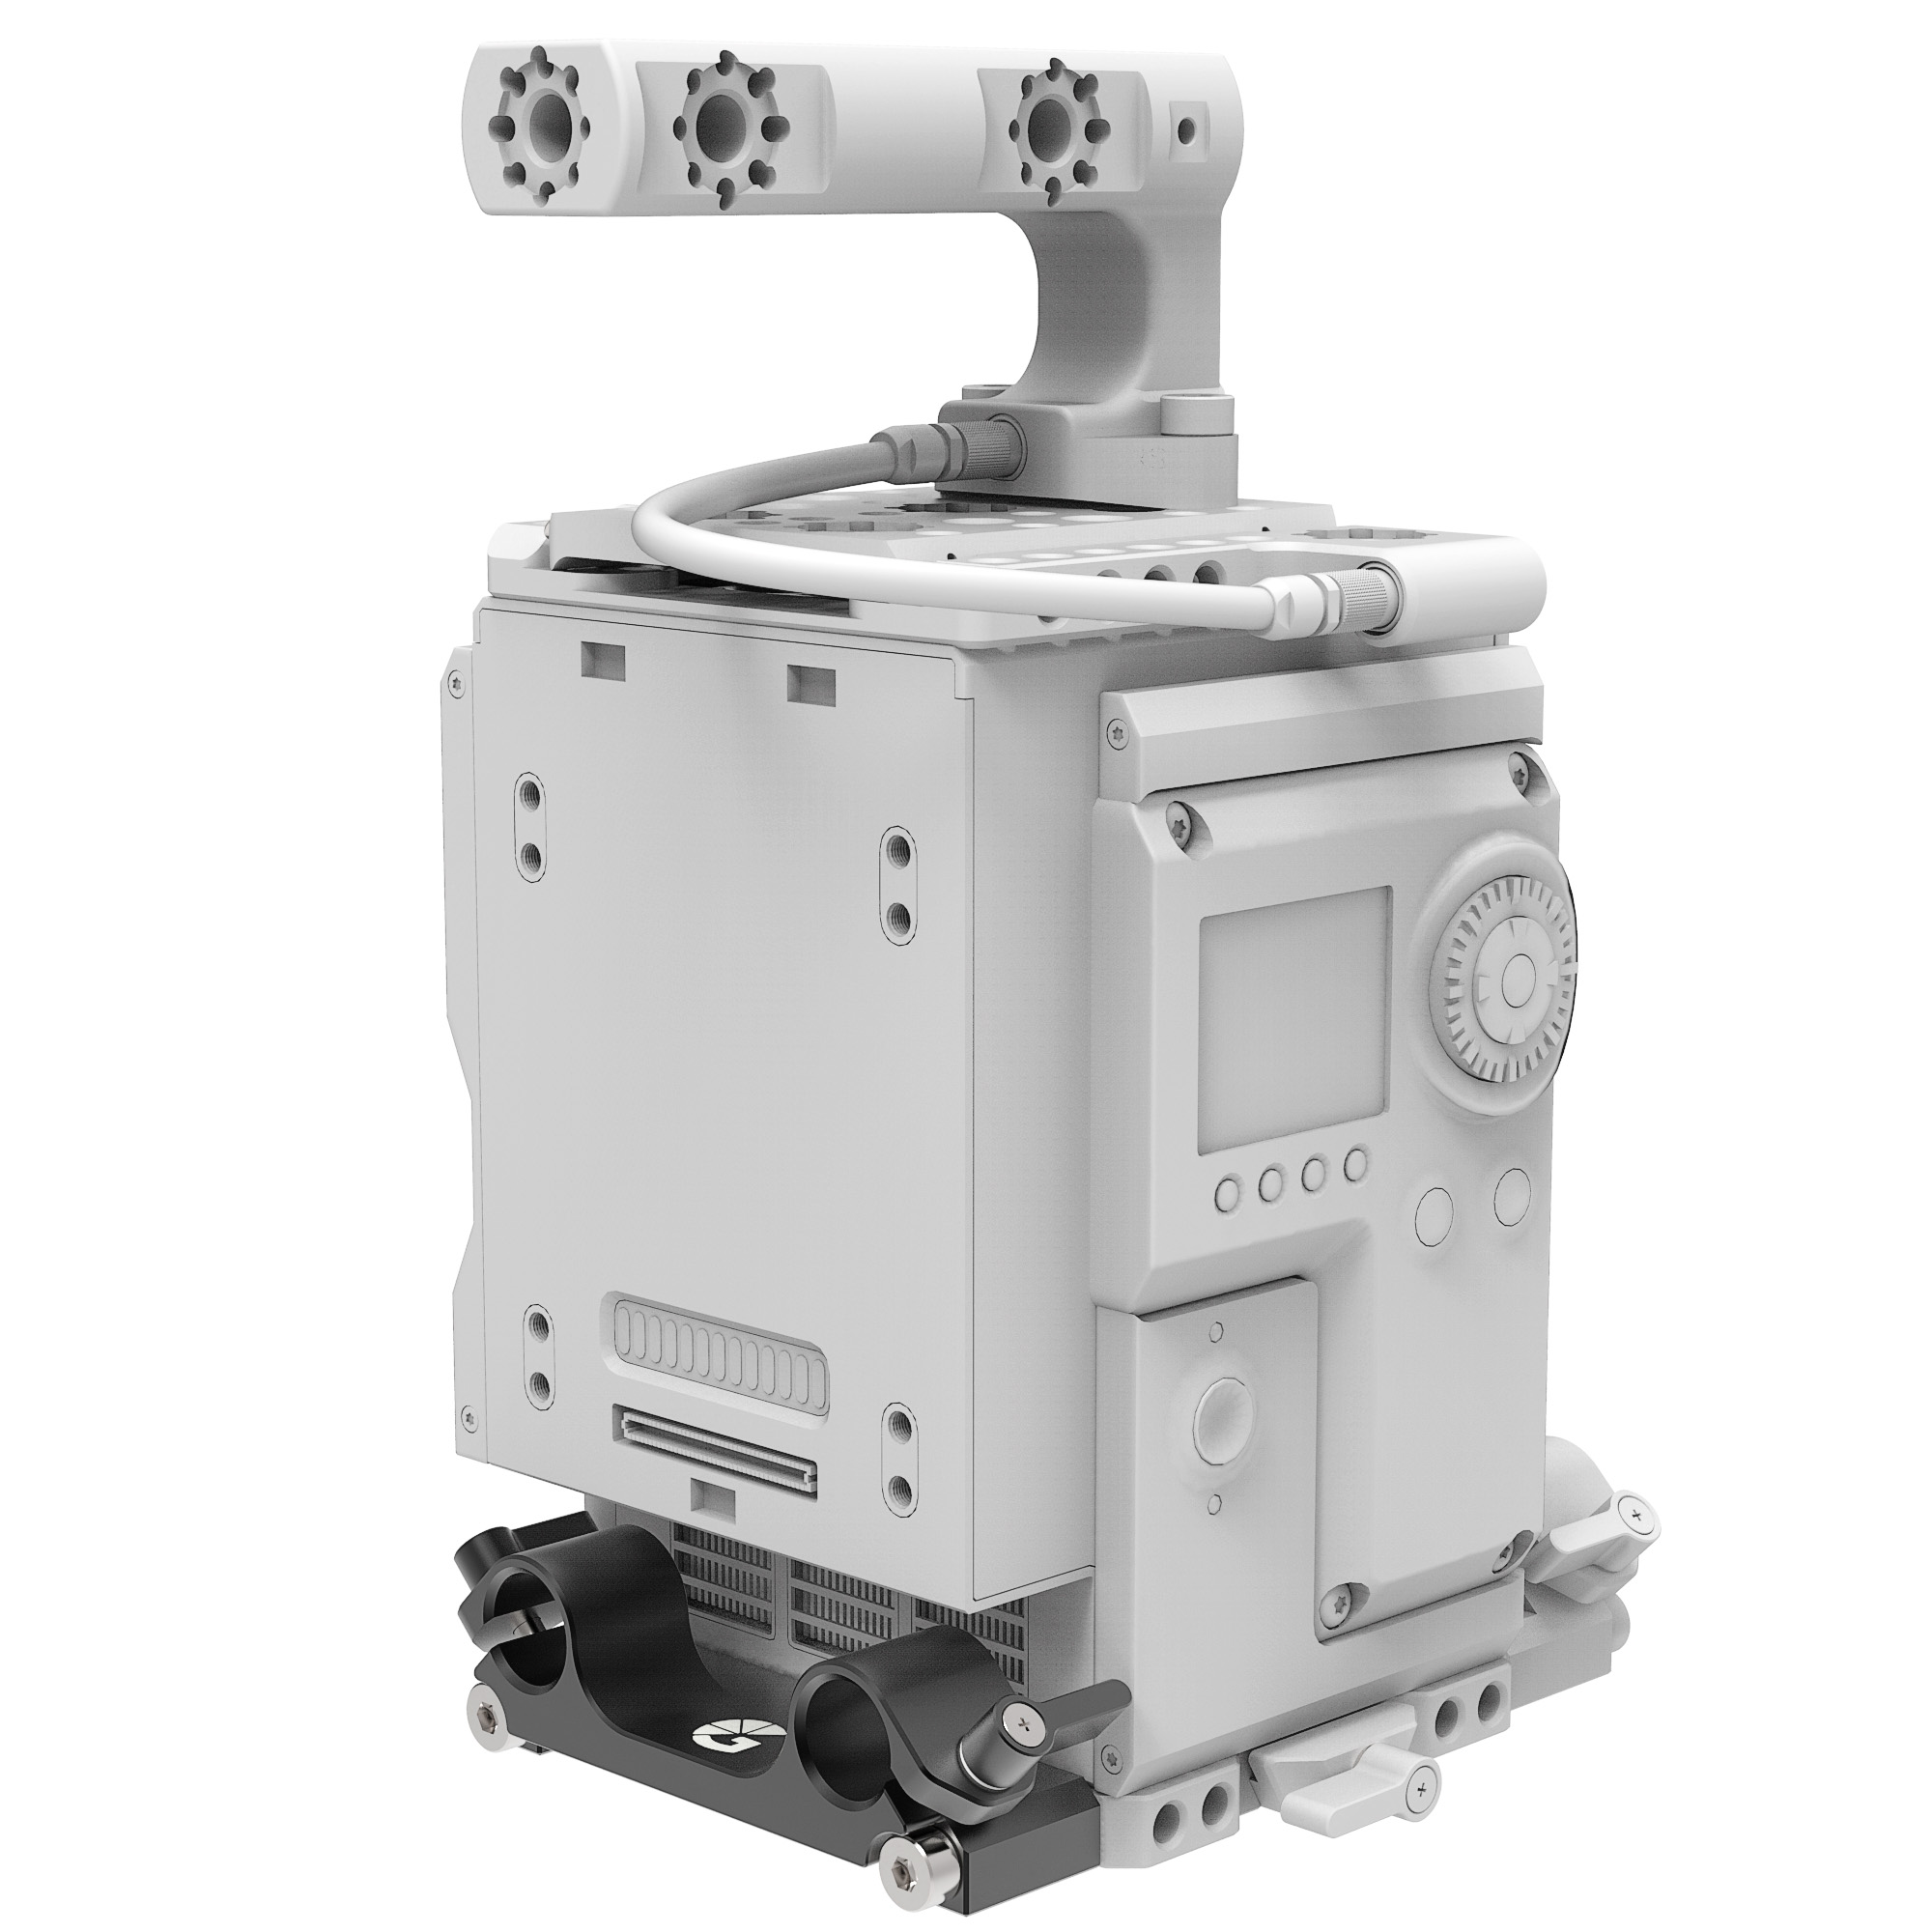 B4002.1003 15mm LWS mount for DSMC2 4